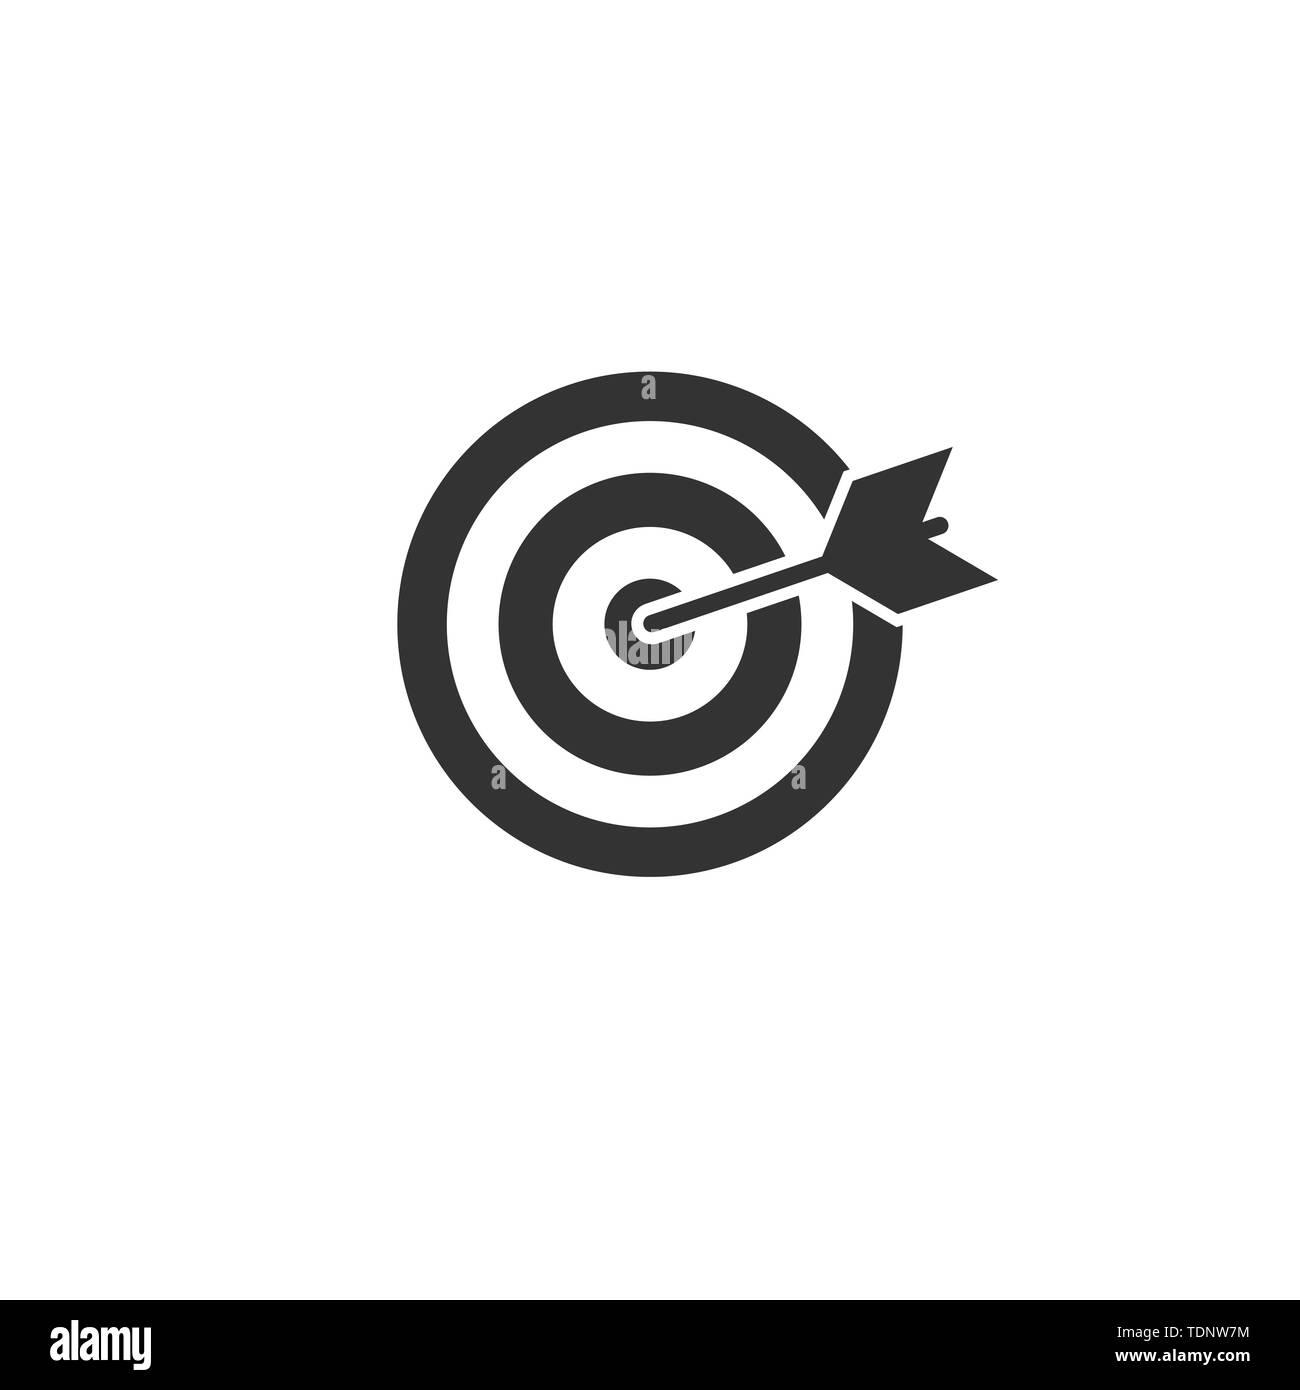 Archery Logo Black and White Stock Photos & Images - Alamy